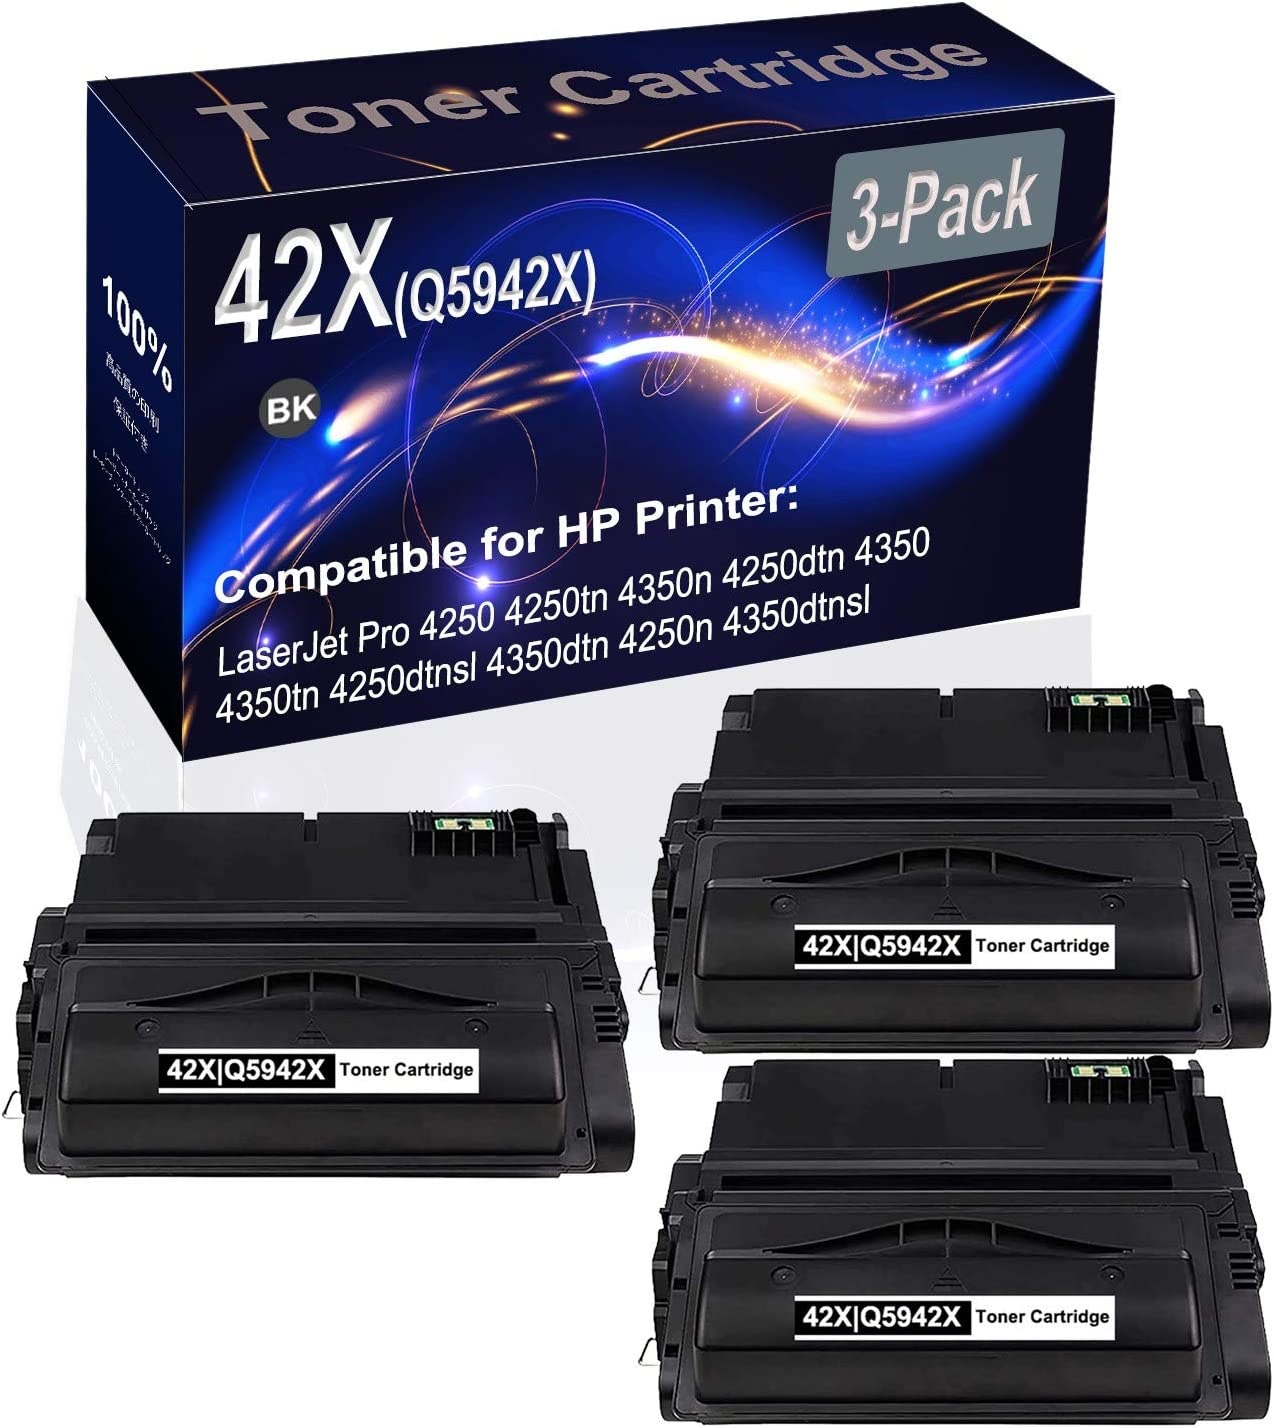 3-Pack (Black) Compatible 42X Q5942X Printer Toner Cartridge (High Capacity) fit for HP 4250 4250tn 4350n 4250dtn 4350 4350tn Printer